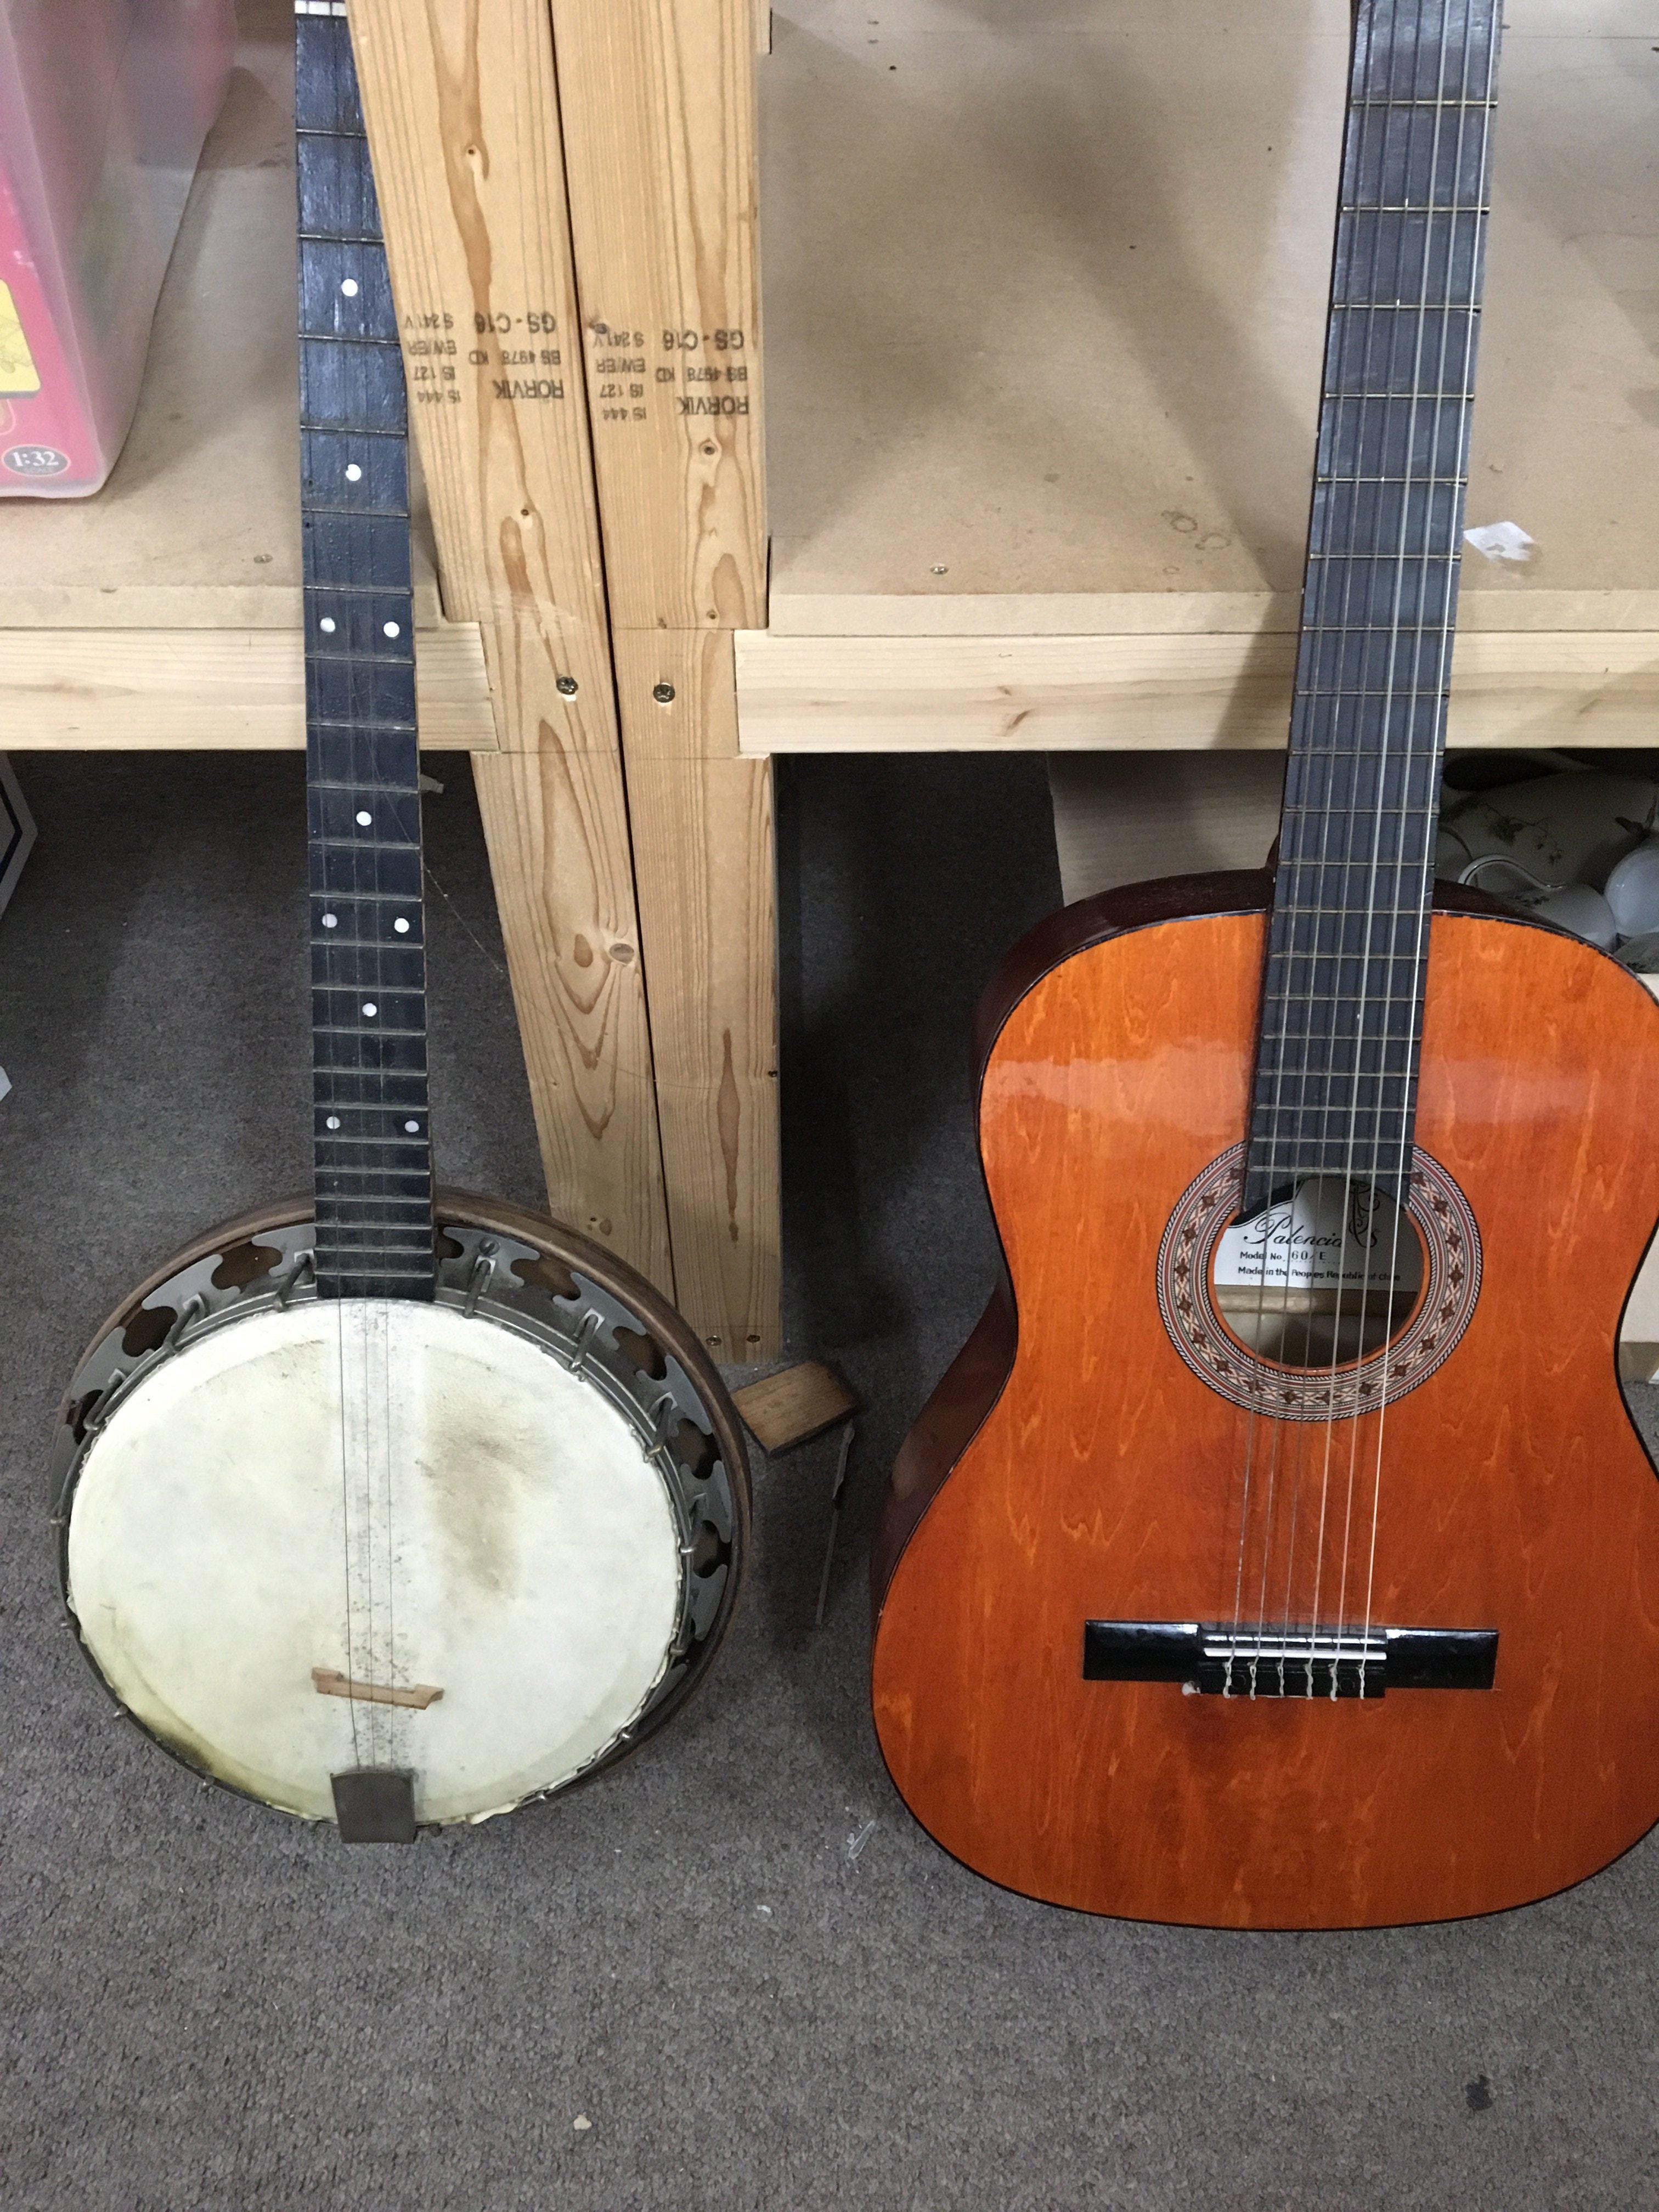 Lot 1874 - A banjo and guitar